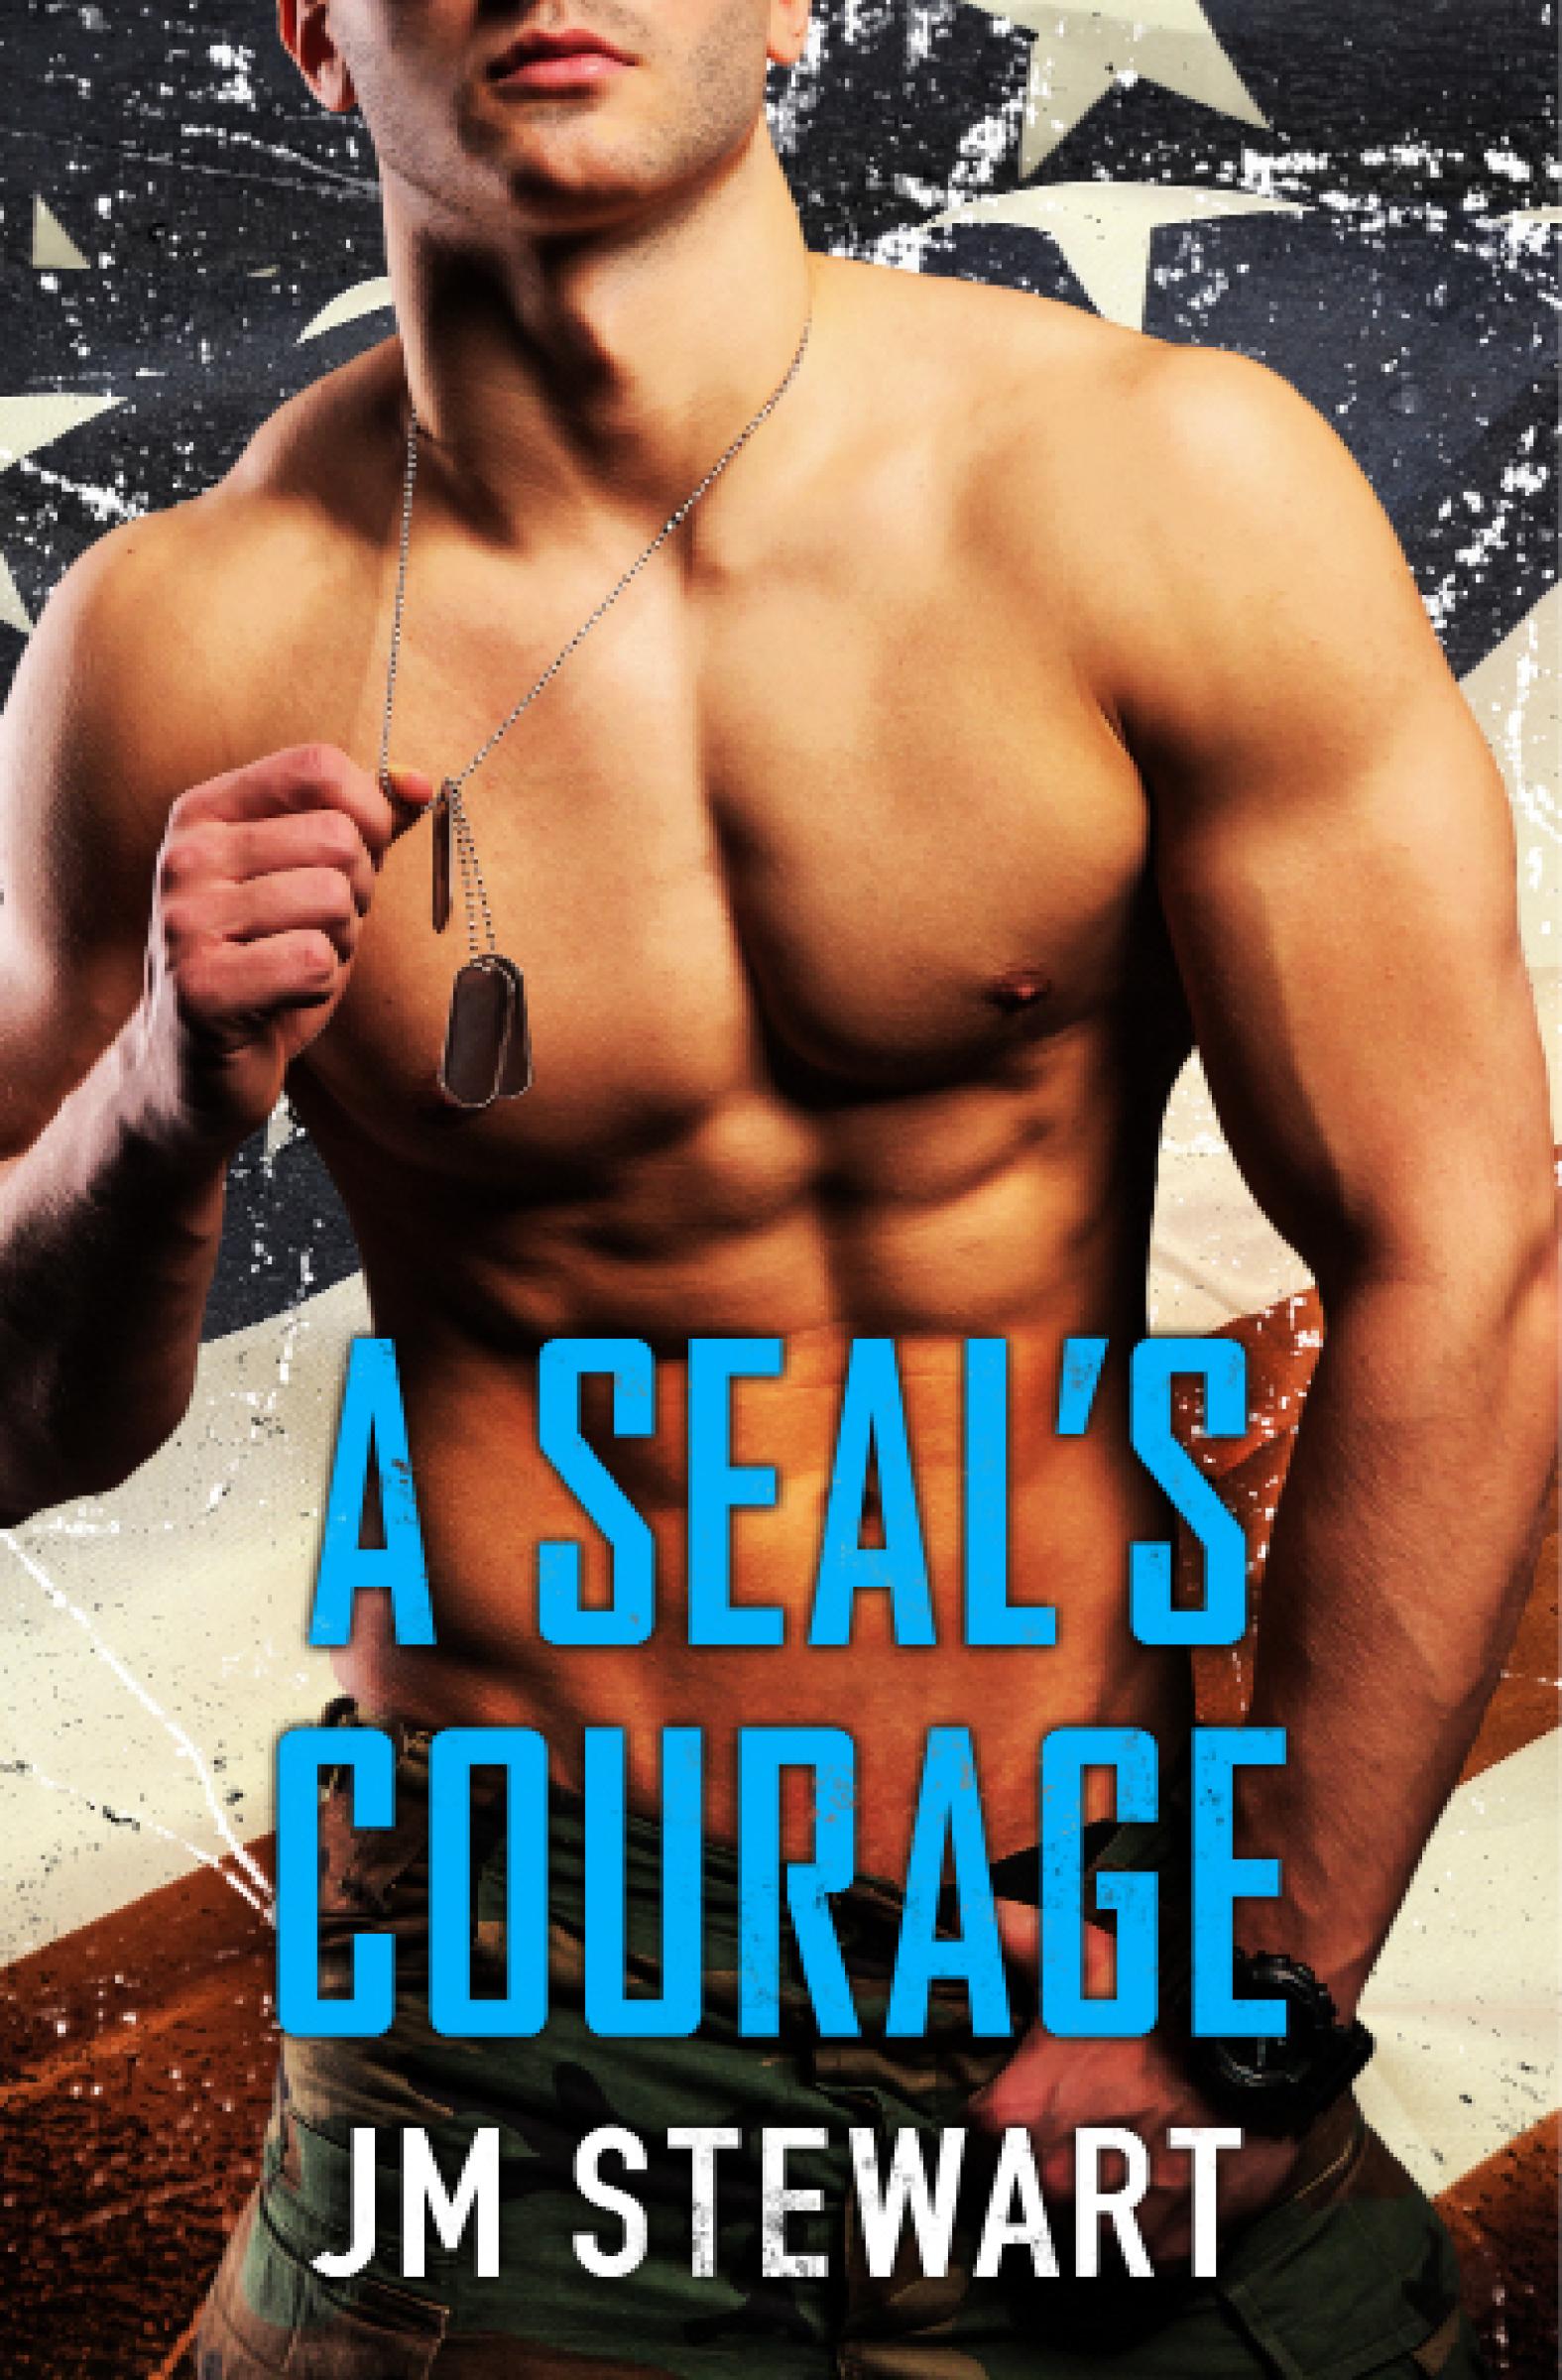 A SEAL's Courage by J.M. Stewart